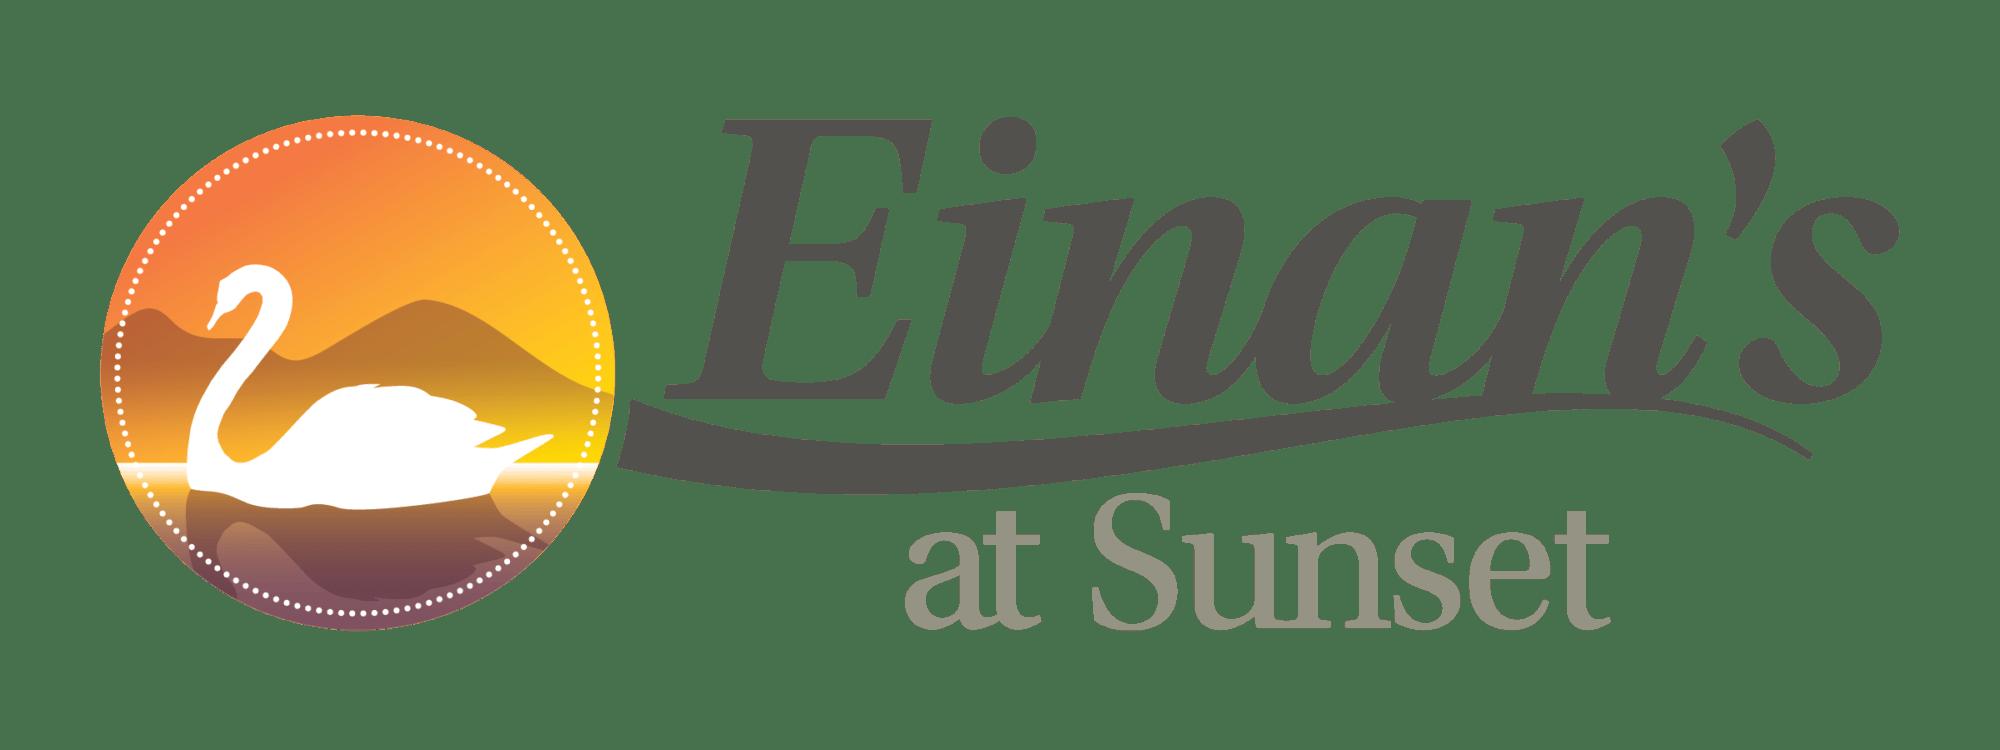 Einans Positive RGB H - FEMA COVID-19 Funeral Assistance